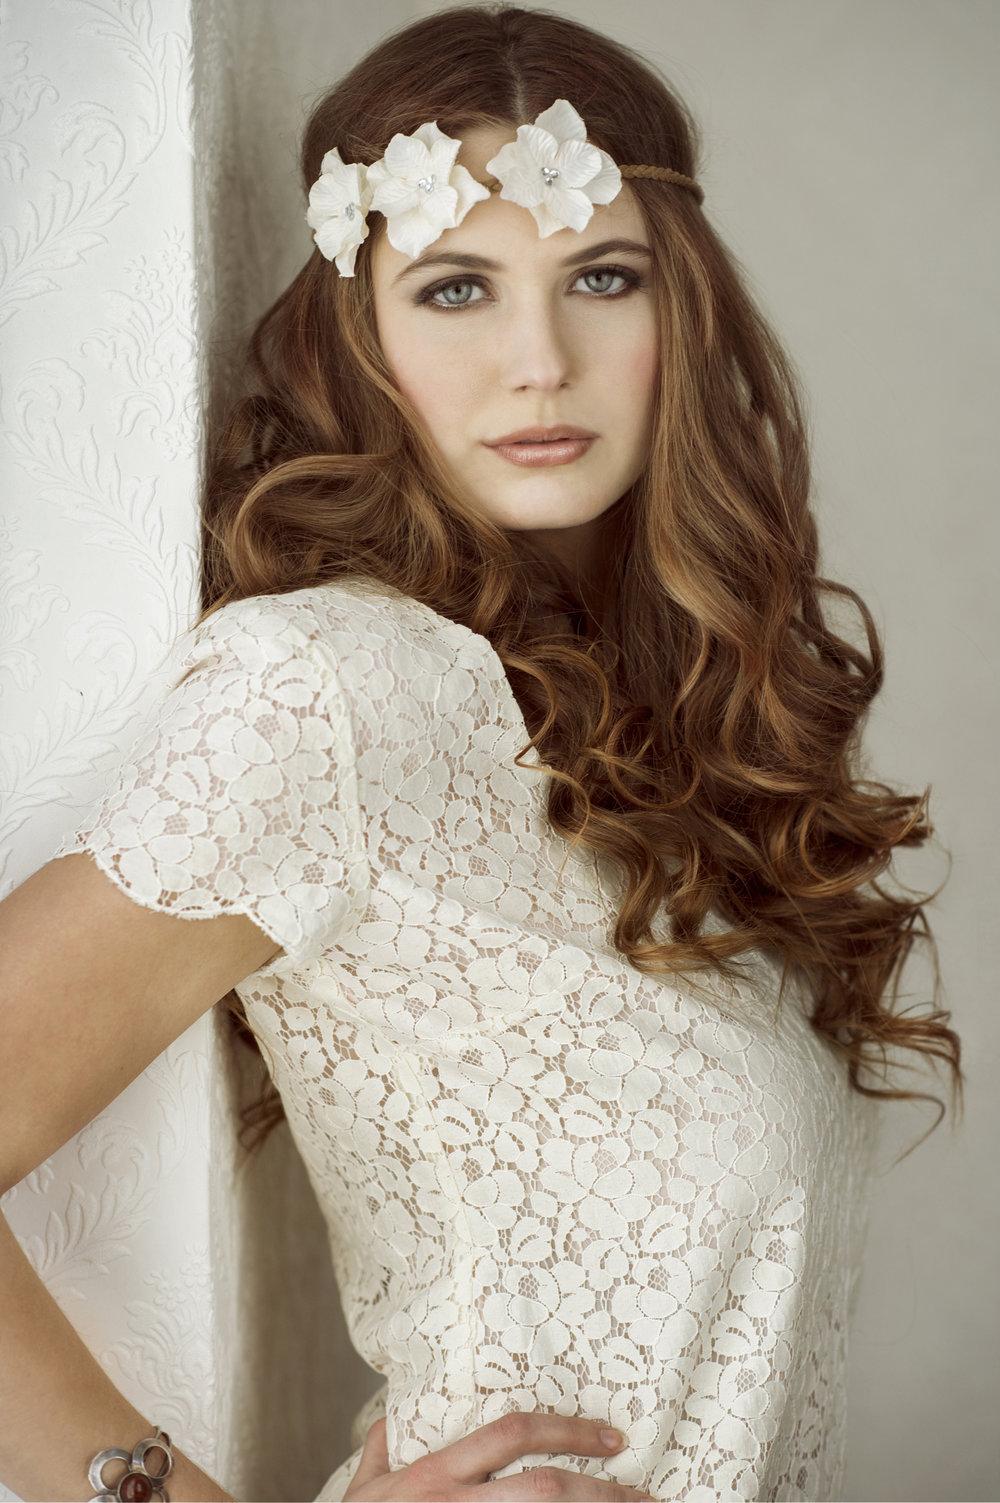 Marta-Hewson-Classical-portrait-teen-white-dress-flowers-in-her-hair.jpg